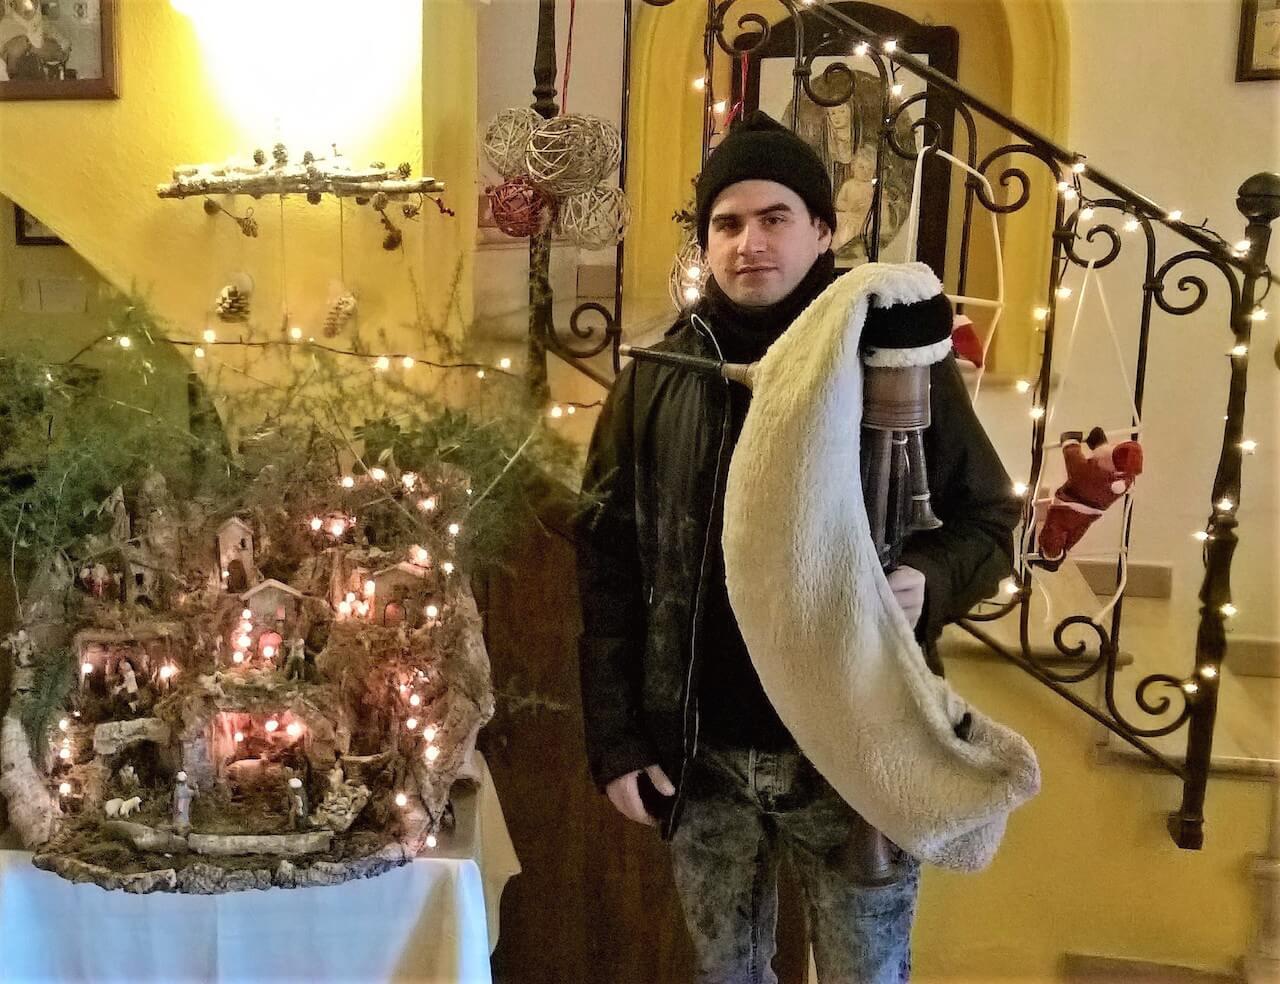 q.b.レシピのないレシピ帳  ~ザンポニャーリが運ぶクリスマス~